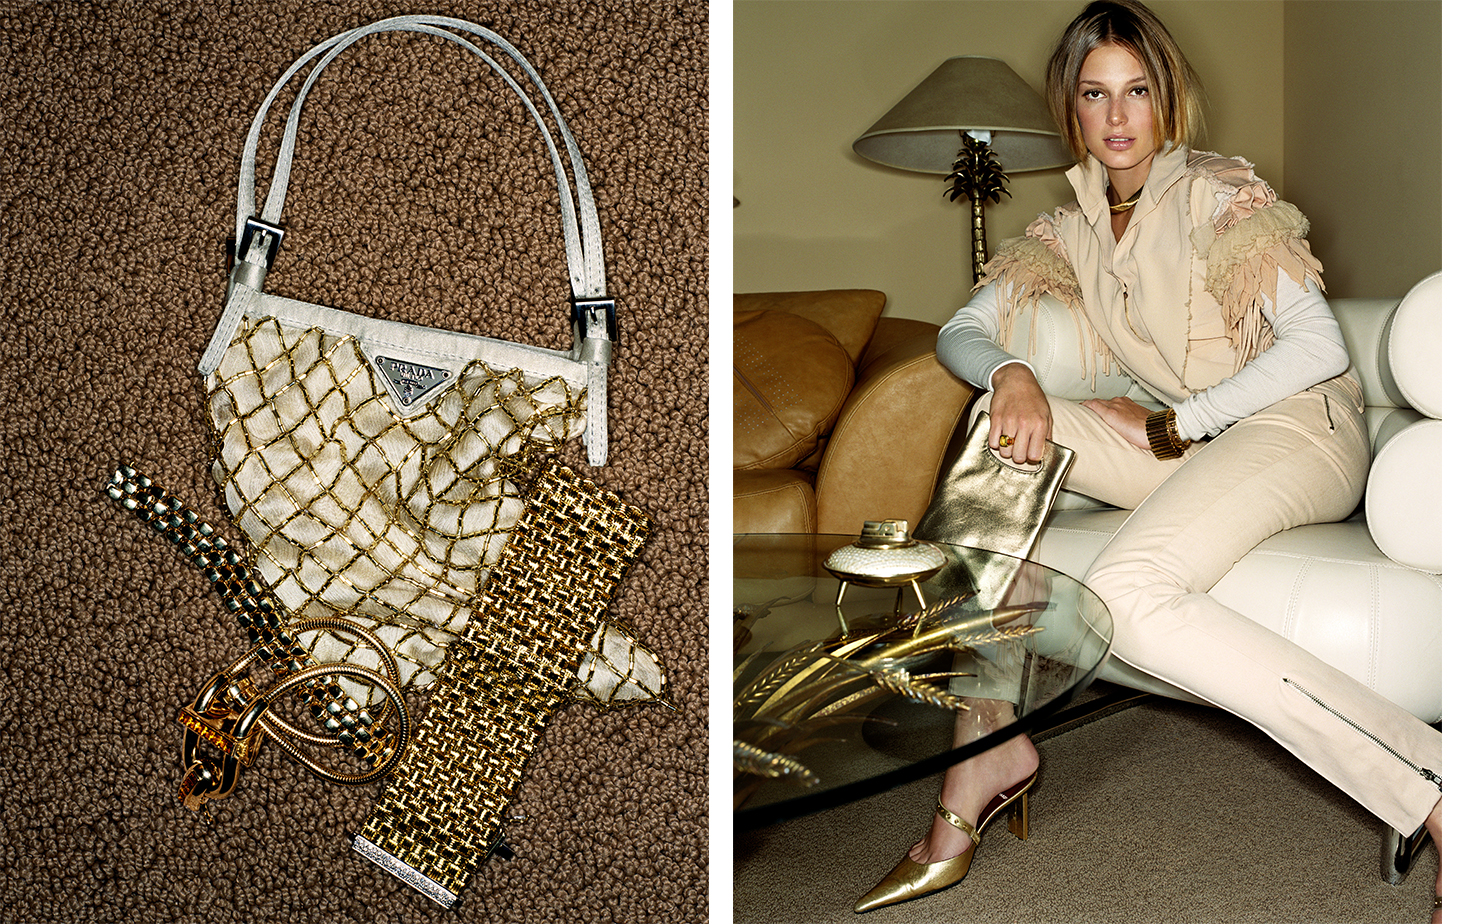 British Vogue GILT TRIP   FASHION EDITOR Tiina Laakkonen MODEL Bridget Hall